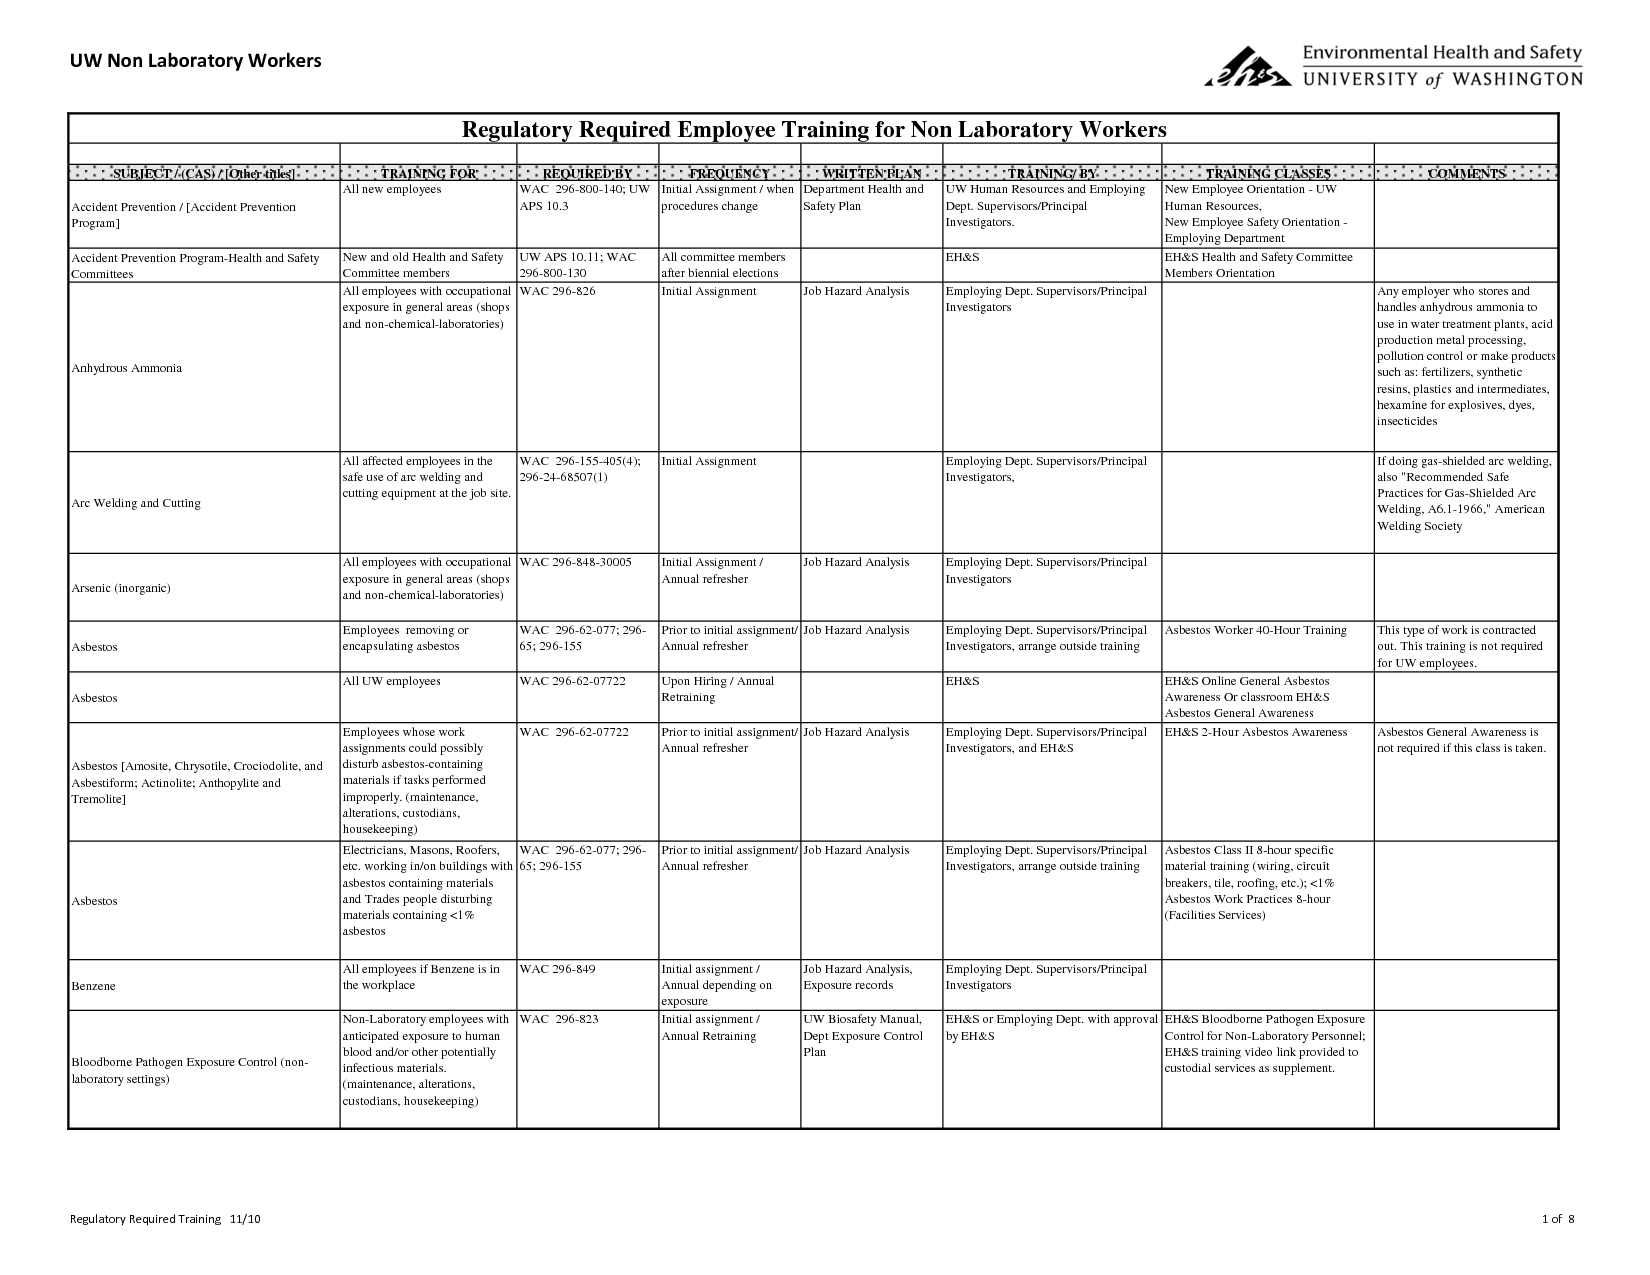 29 Images of Sample Employee Training Plan Template | adornpixels.com